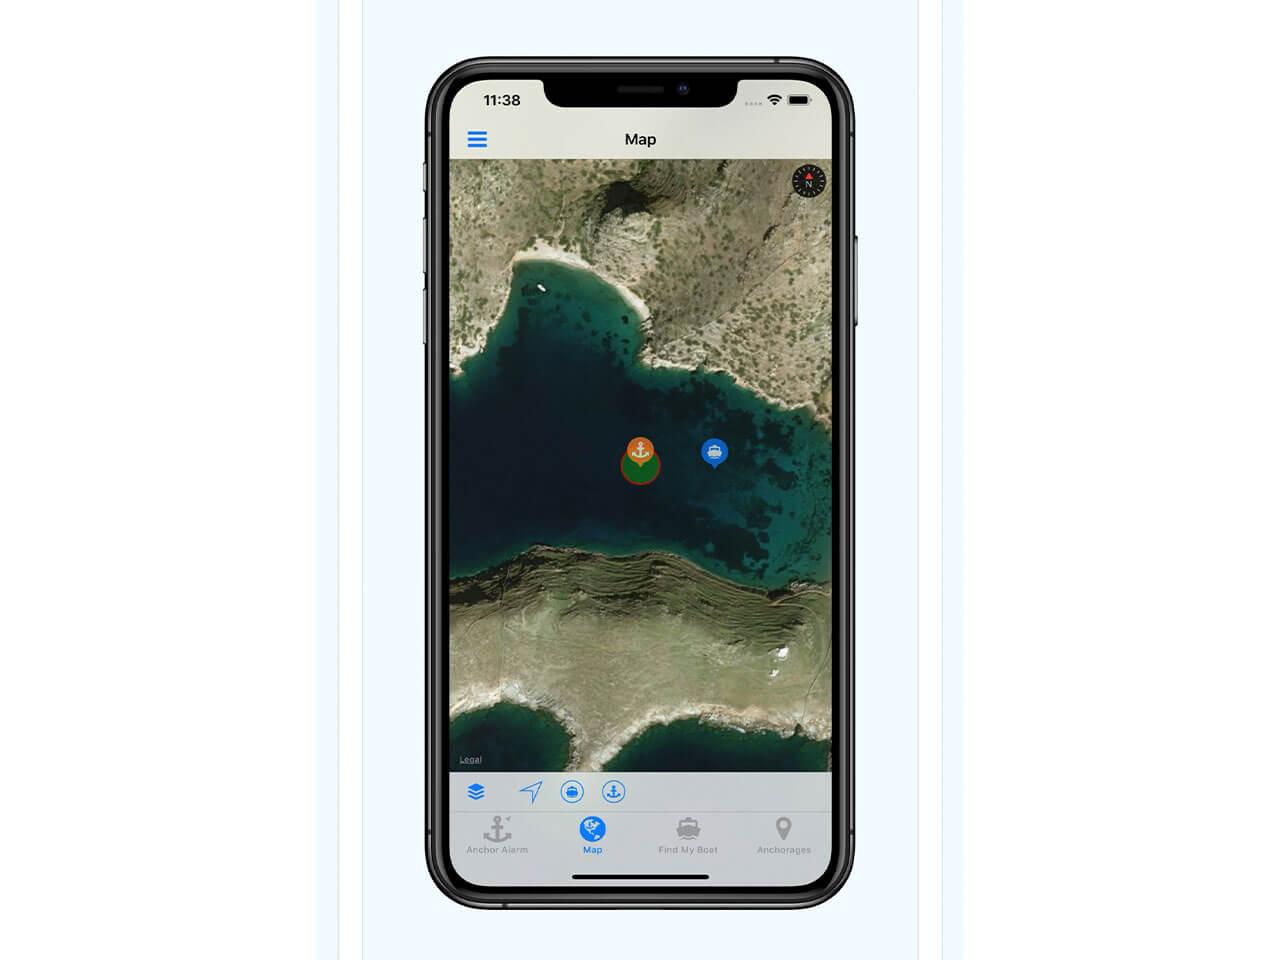 Anchor Alarm App